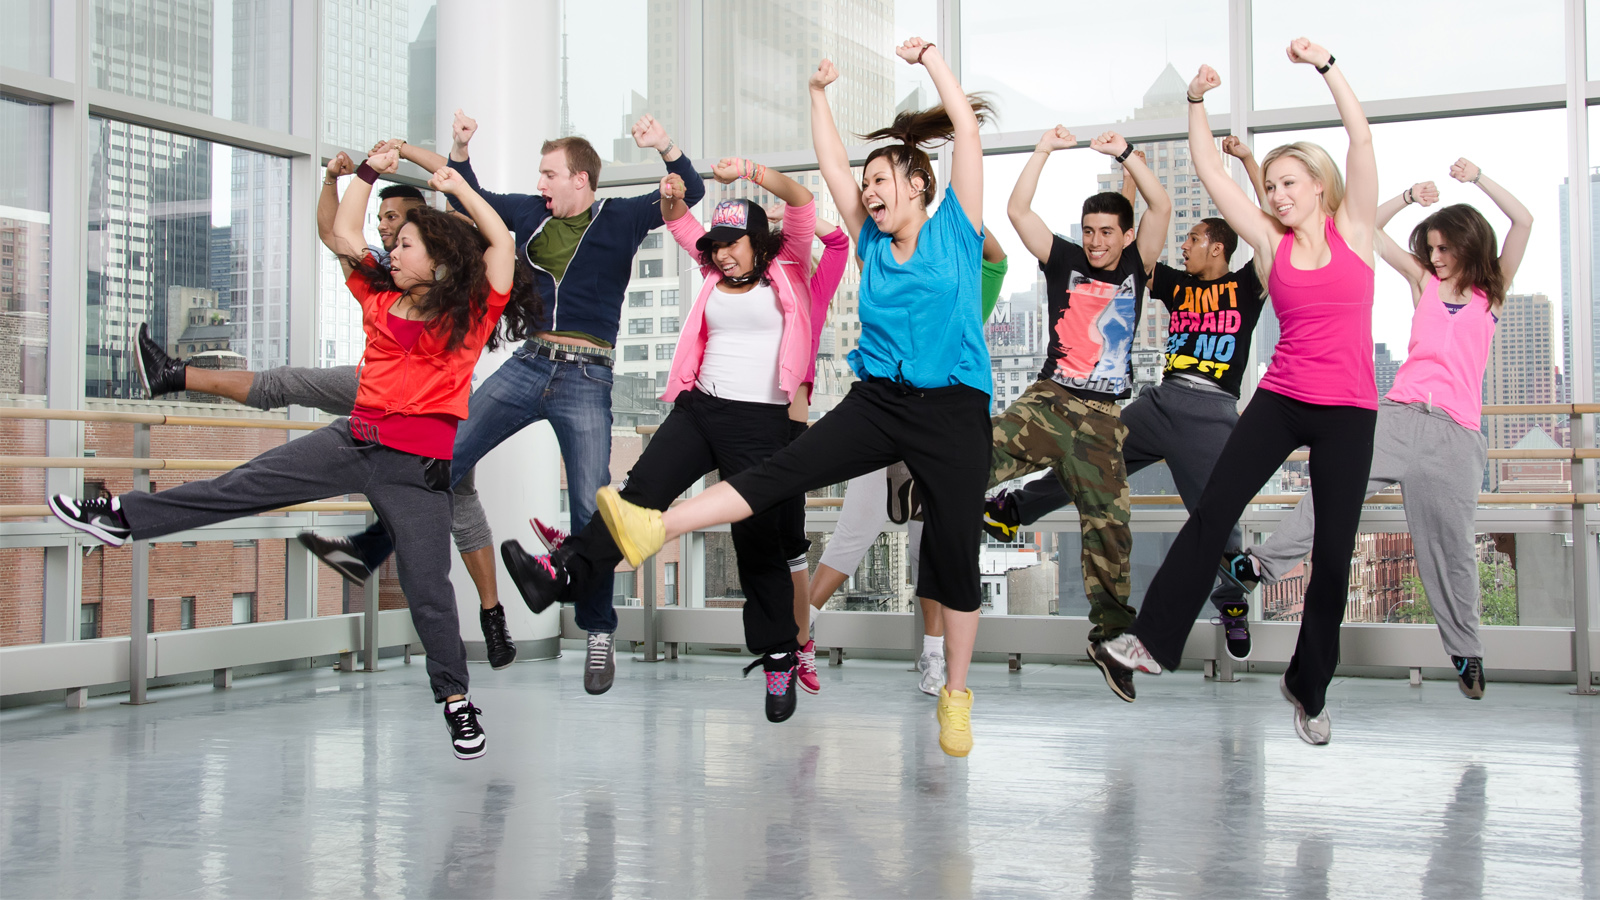 Extension Open House Dance on Basic Dance Steps For Beginners